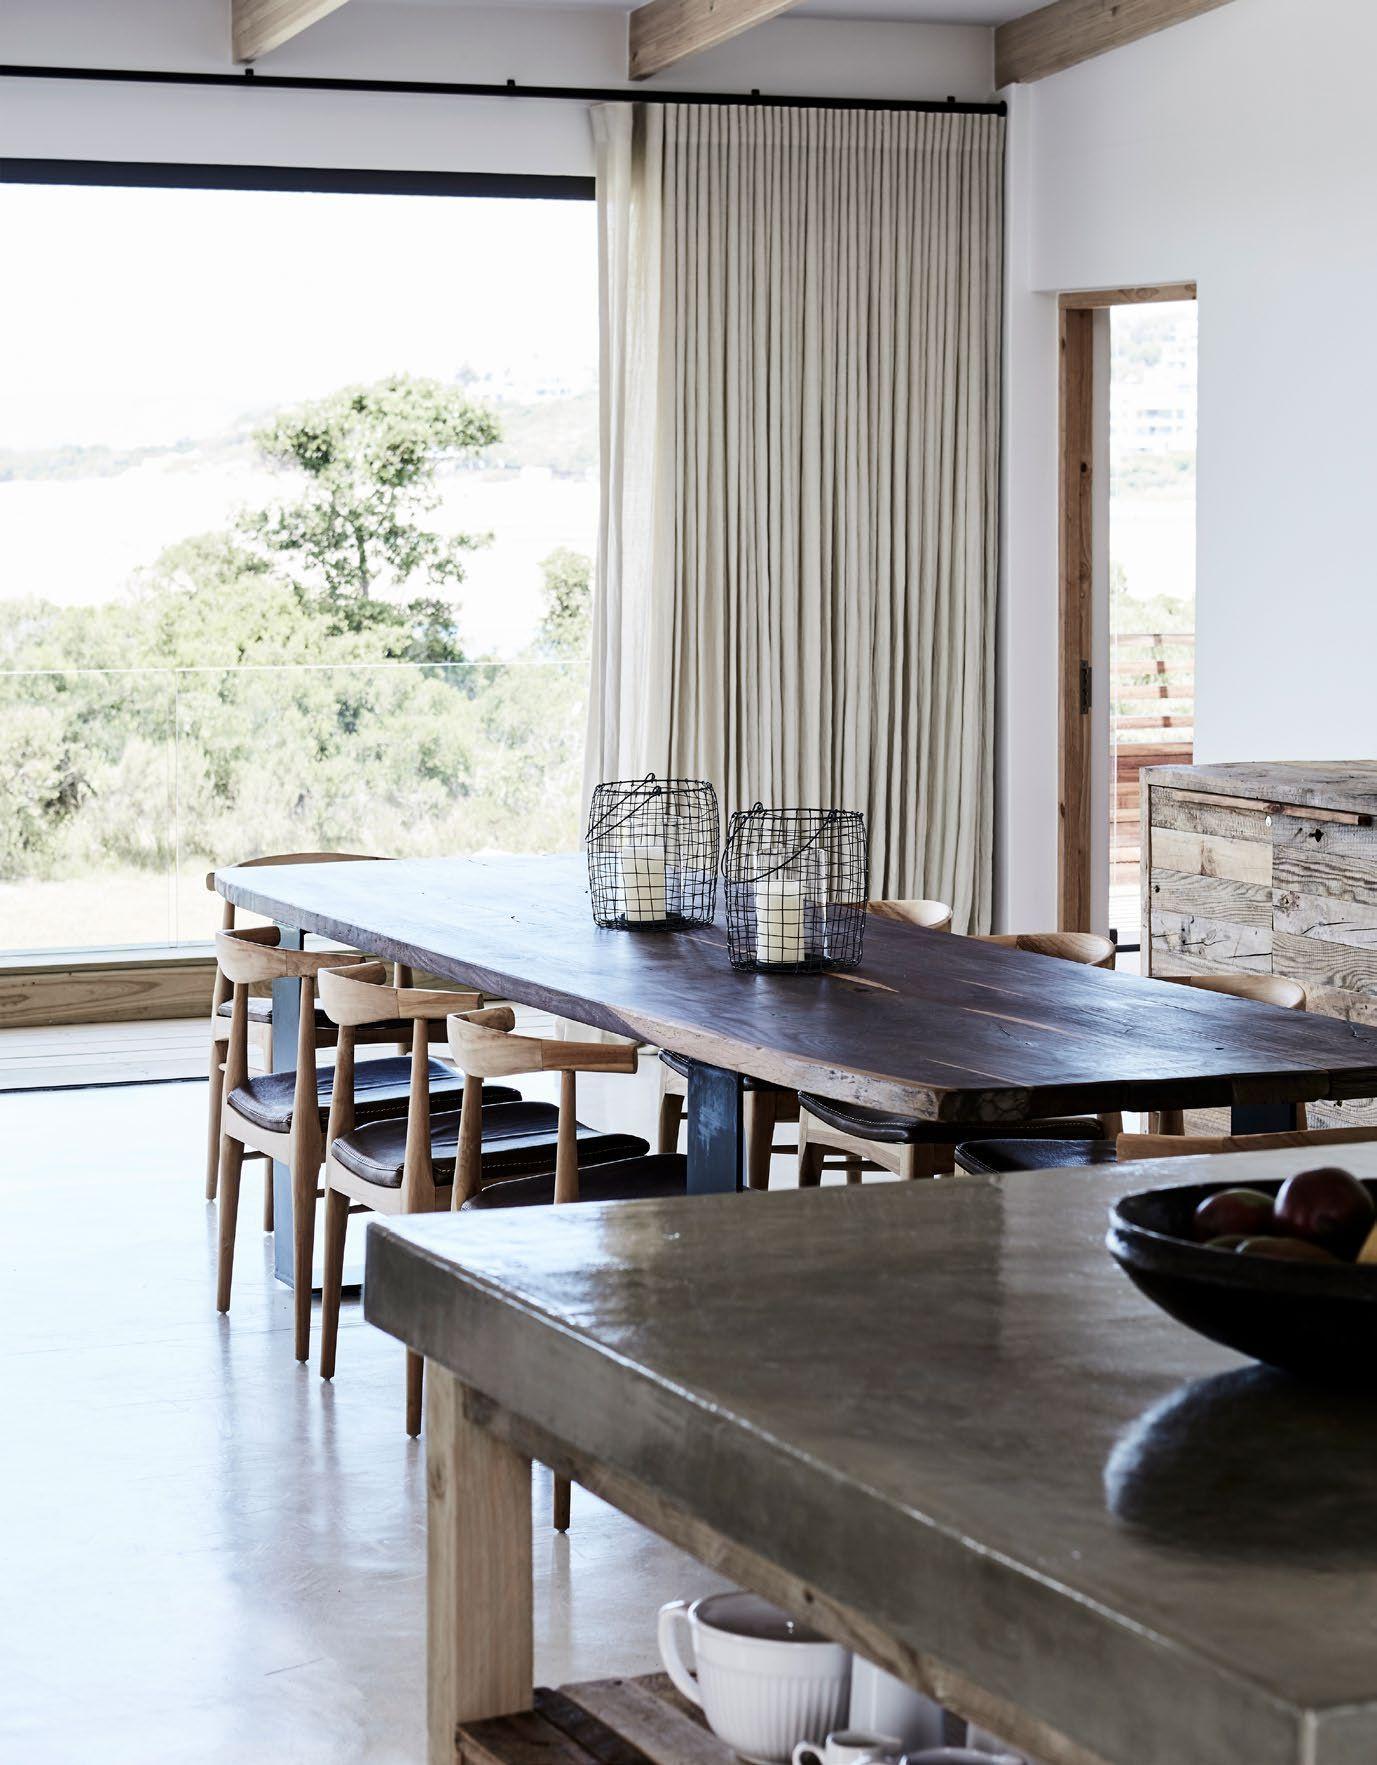 Est living home inspiration interior design decor interiors magazine minimal minimalist homes summer also issue rh pinterest